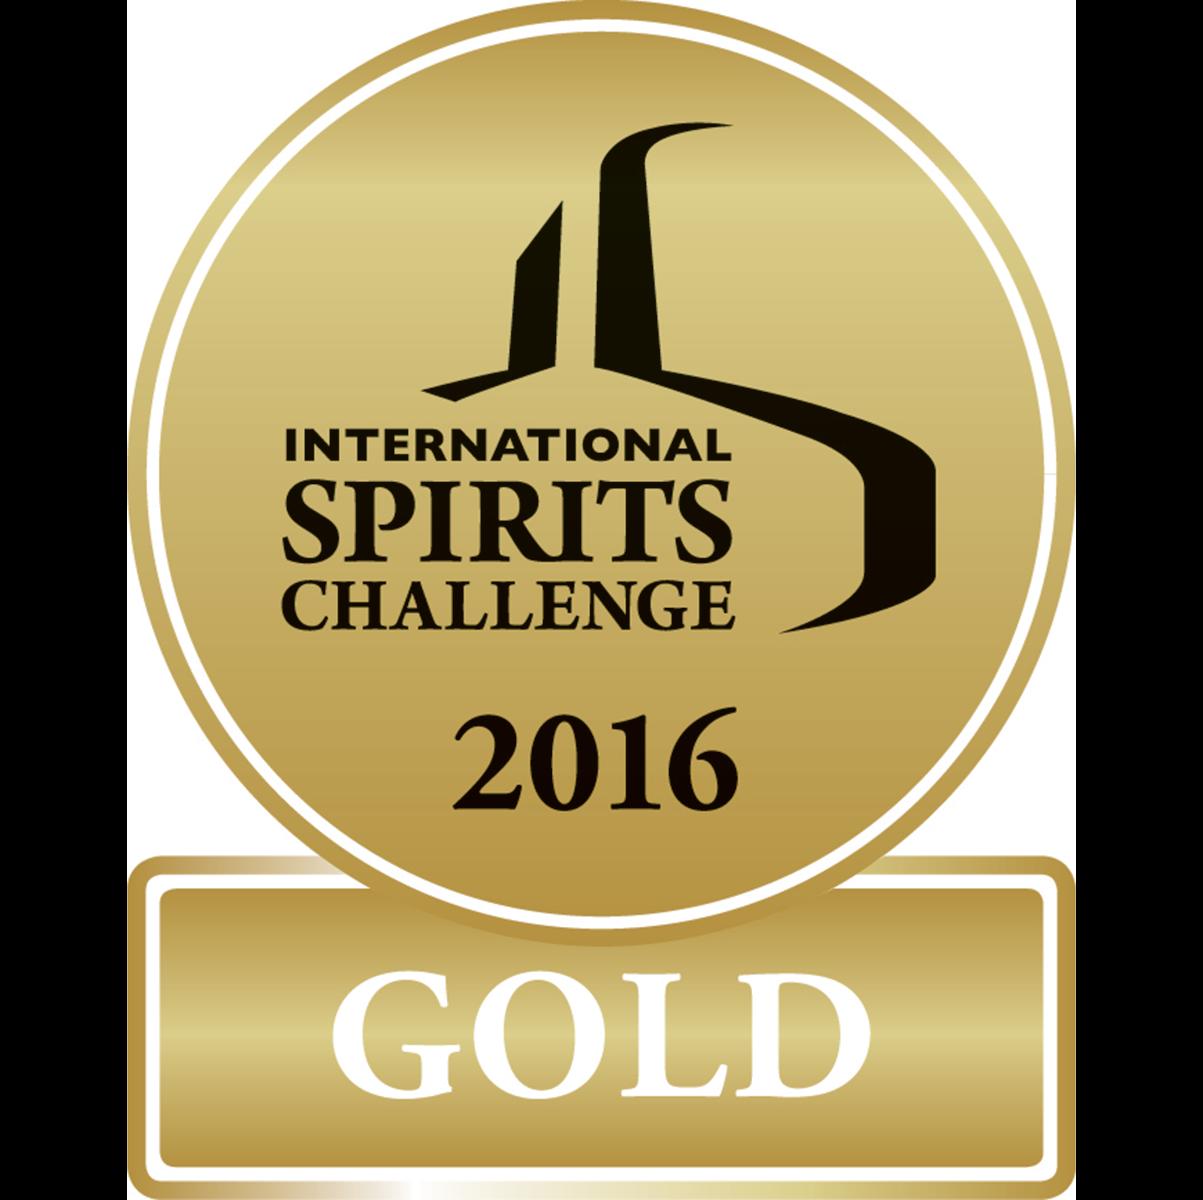 caption=Medalha de Ouro !! International Spirits Challenge 2016; class=medalha; alt=Medalha